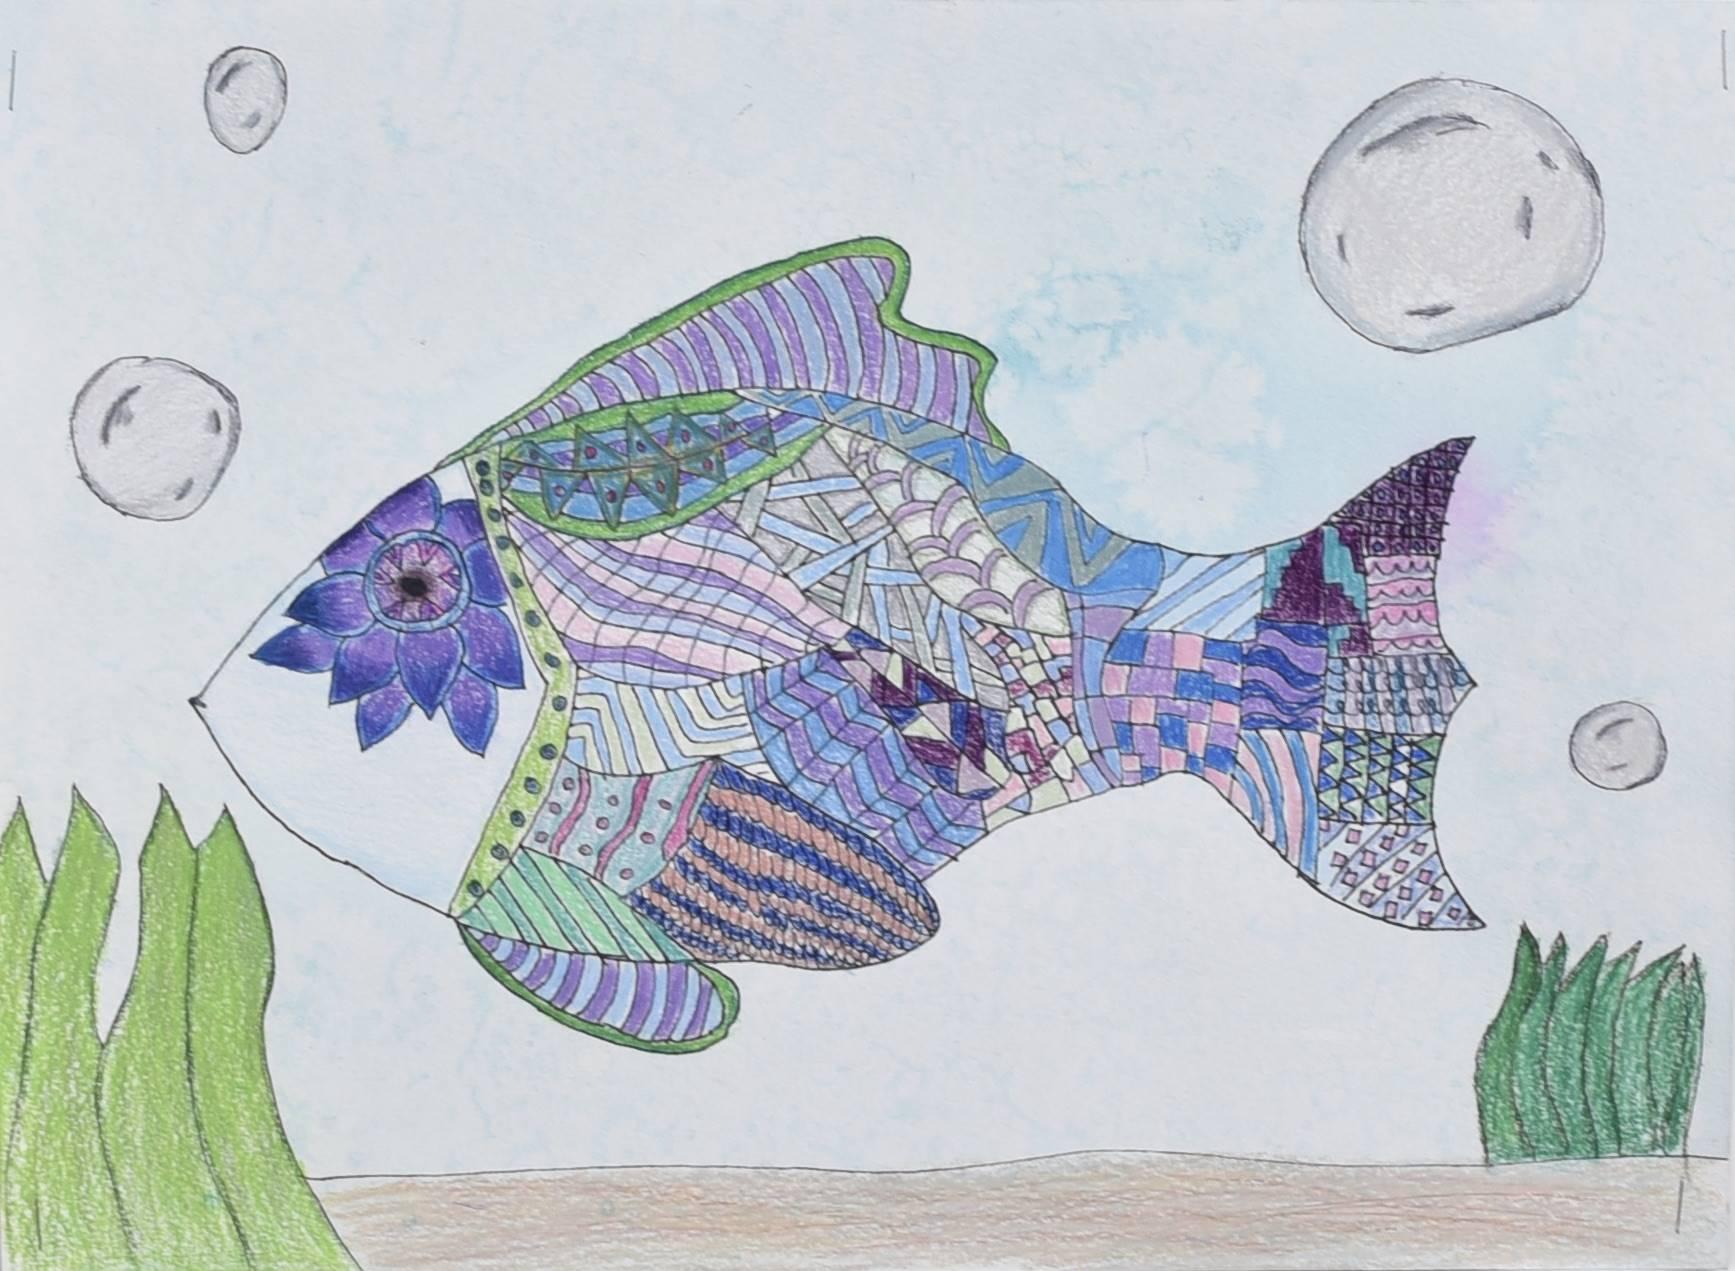 Brecksville-Broadview Hts. Middle School Art Projects 139